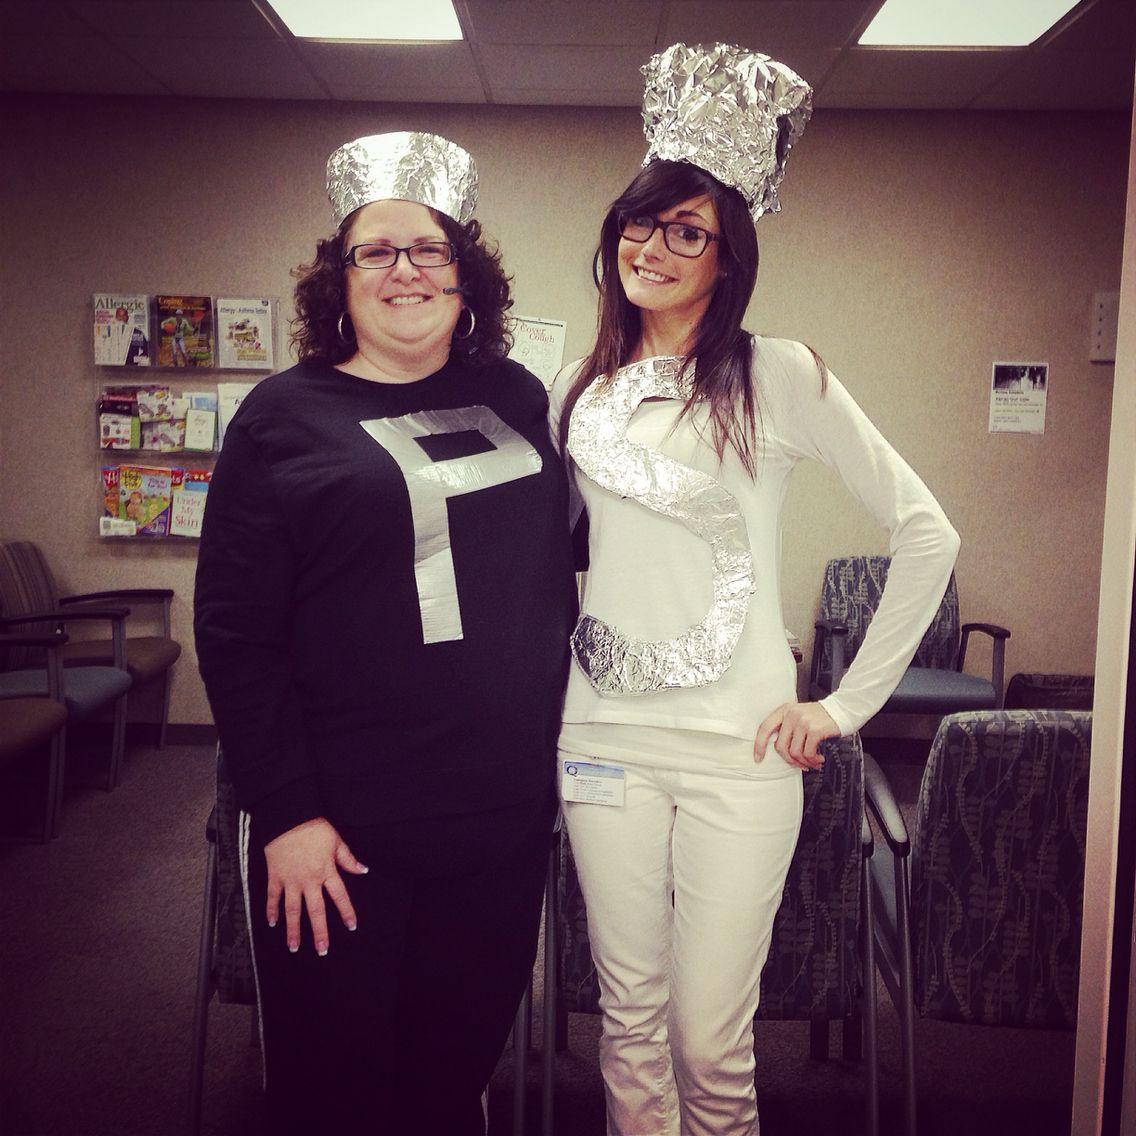 Salt & Pepper Shaker Costumes Holidays Halloween